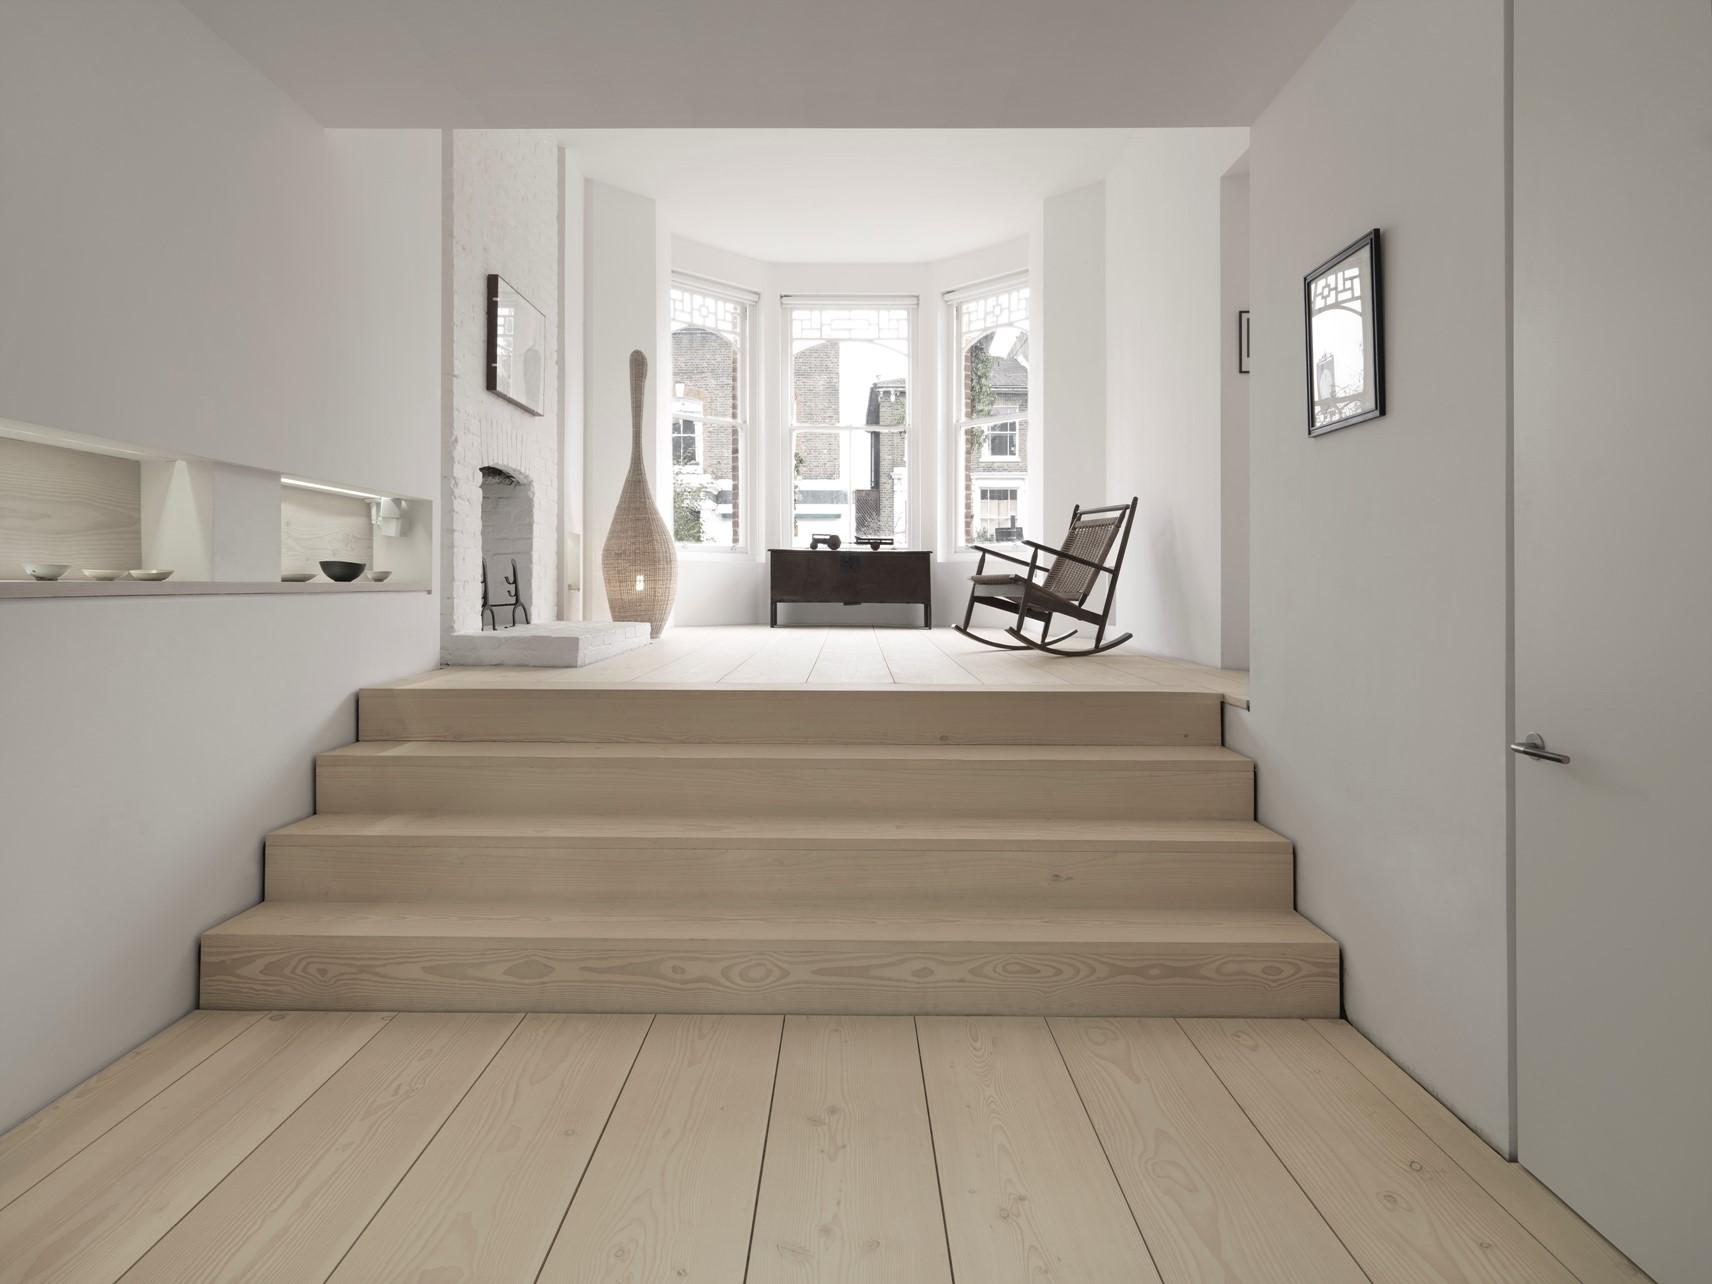 douglas floor lye white soap macdonald wright residence hallway dinesen.jpg